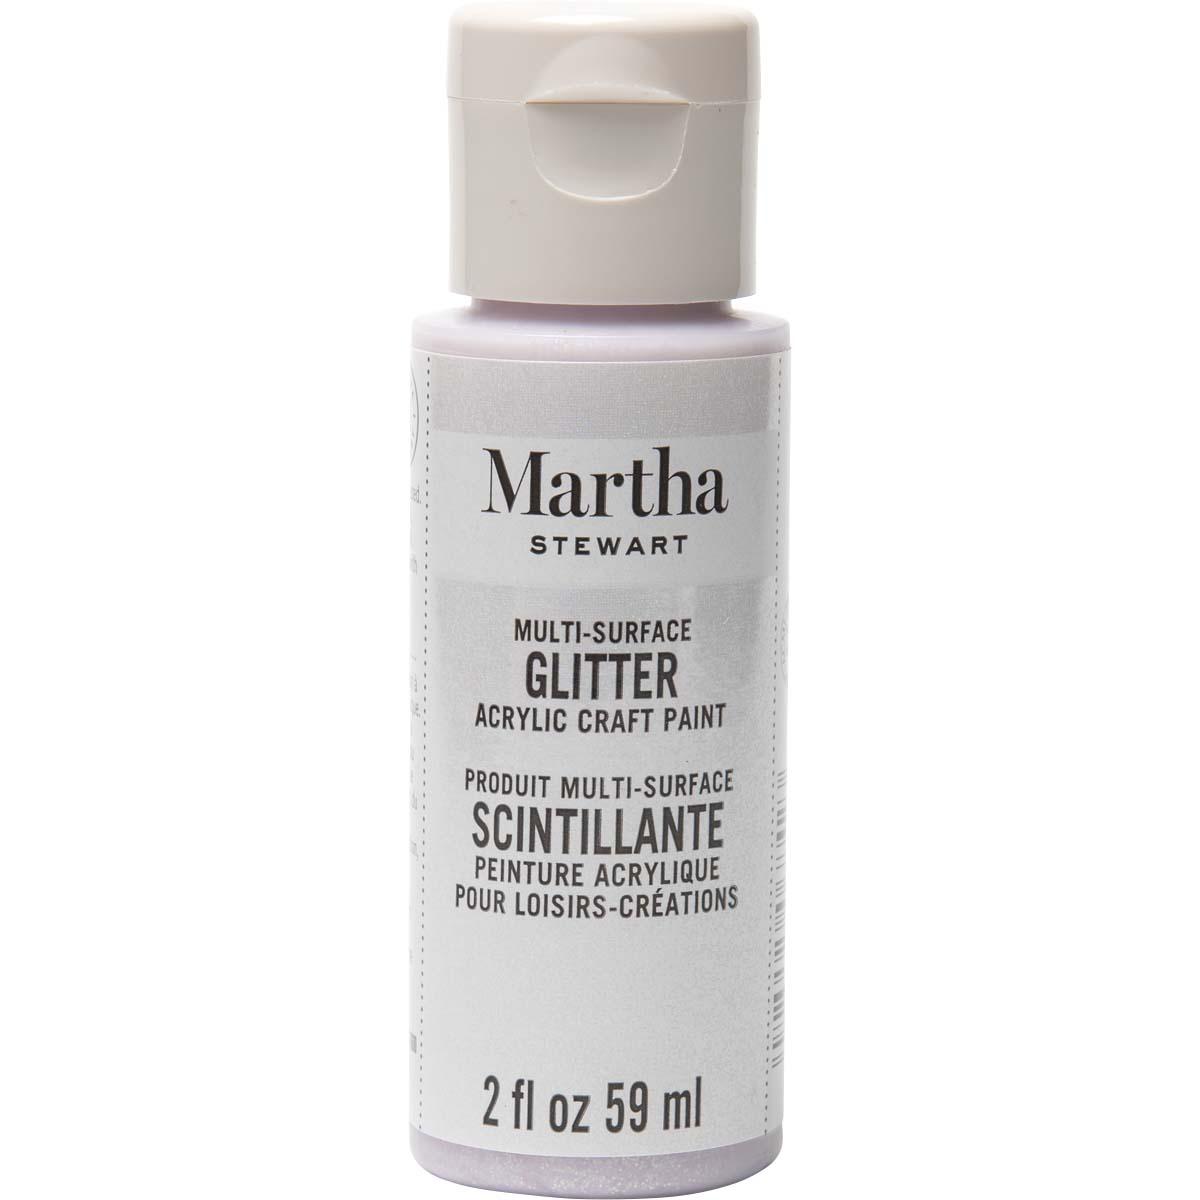 Martha Stewart® 2oz Multi-Surface Glitter Acrylic Craft Paint - Sugar Cube